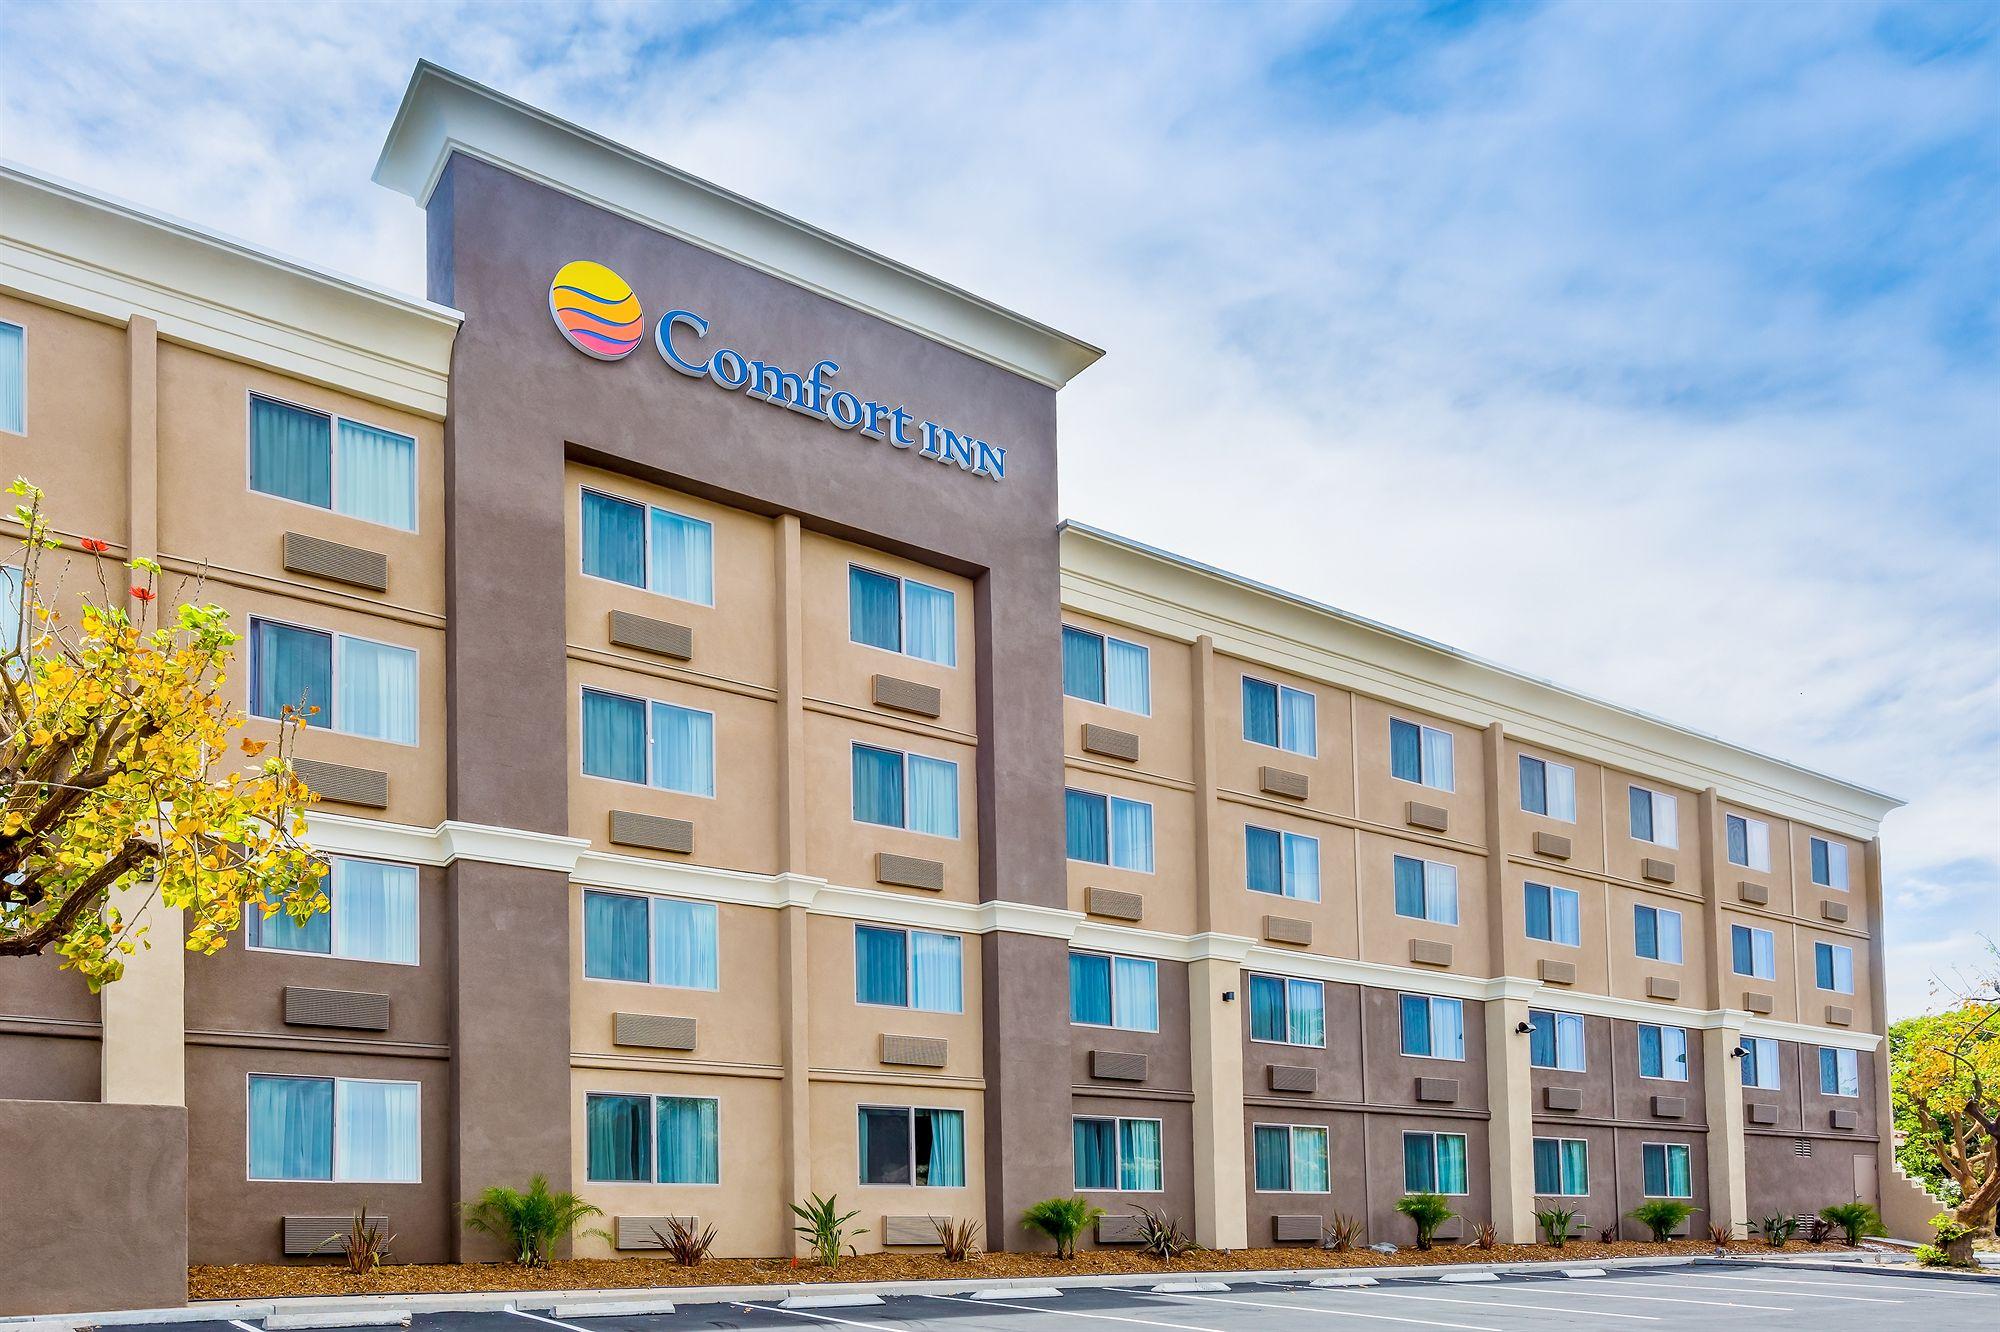 Chula Vista Hotel Coupons for Chula Vista California